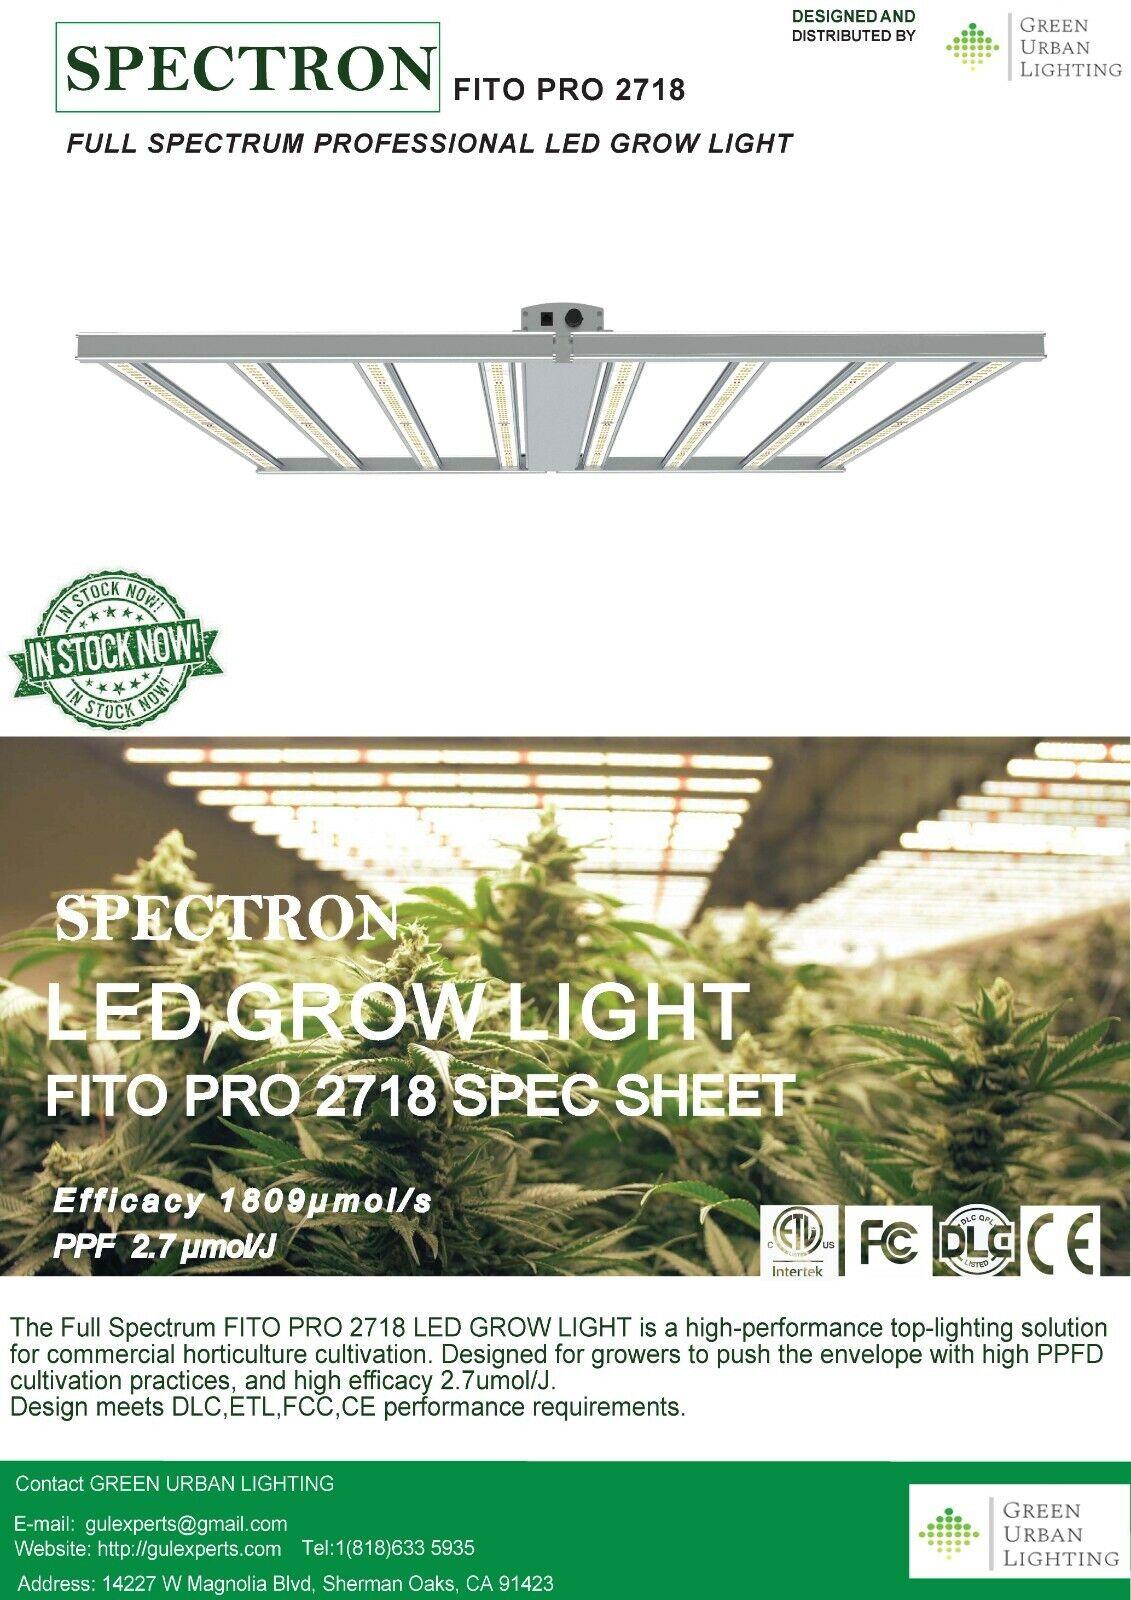 PROFFESIONAL LED GROW LIGHT - $550.00